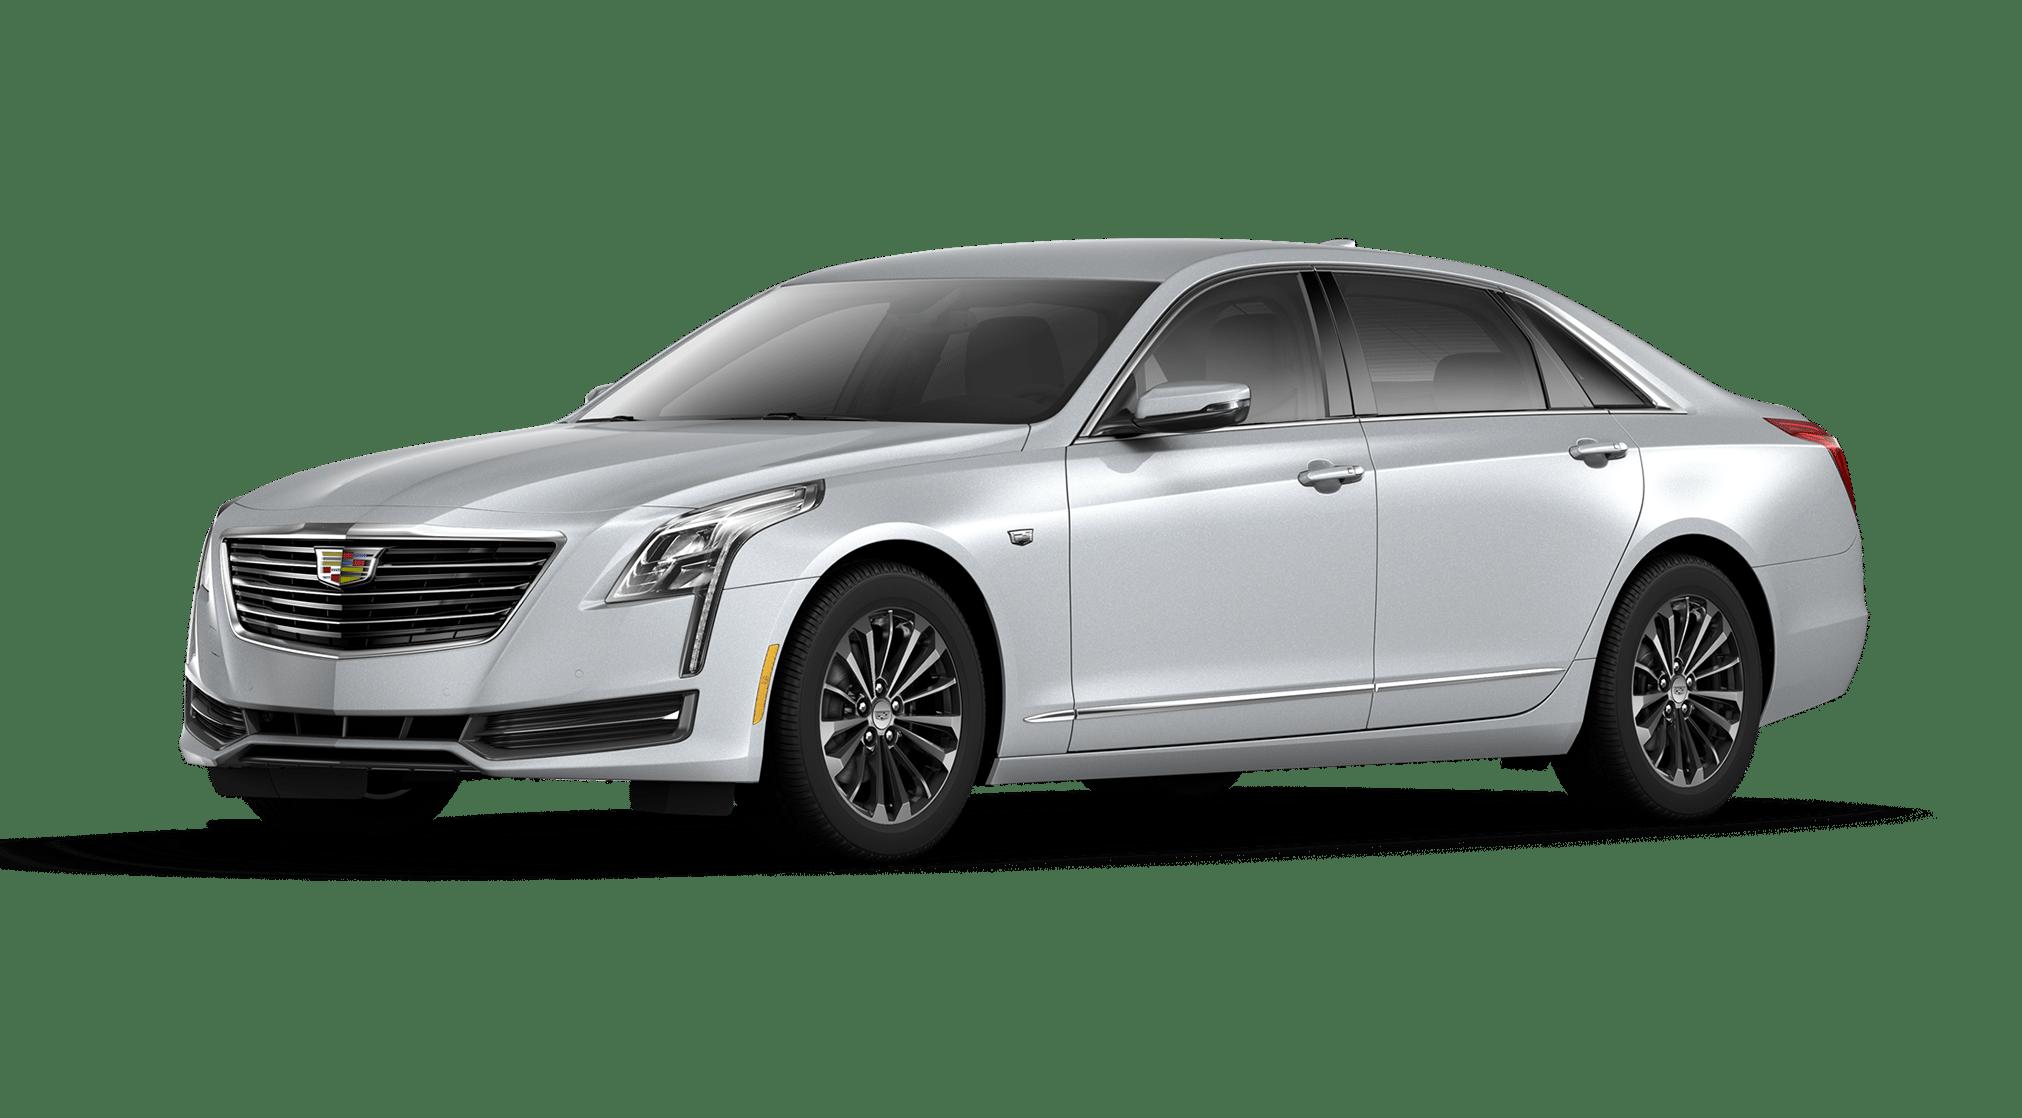 2017 Cadillac CT6 Silver